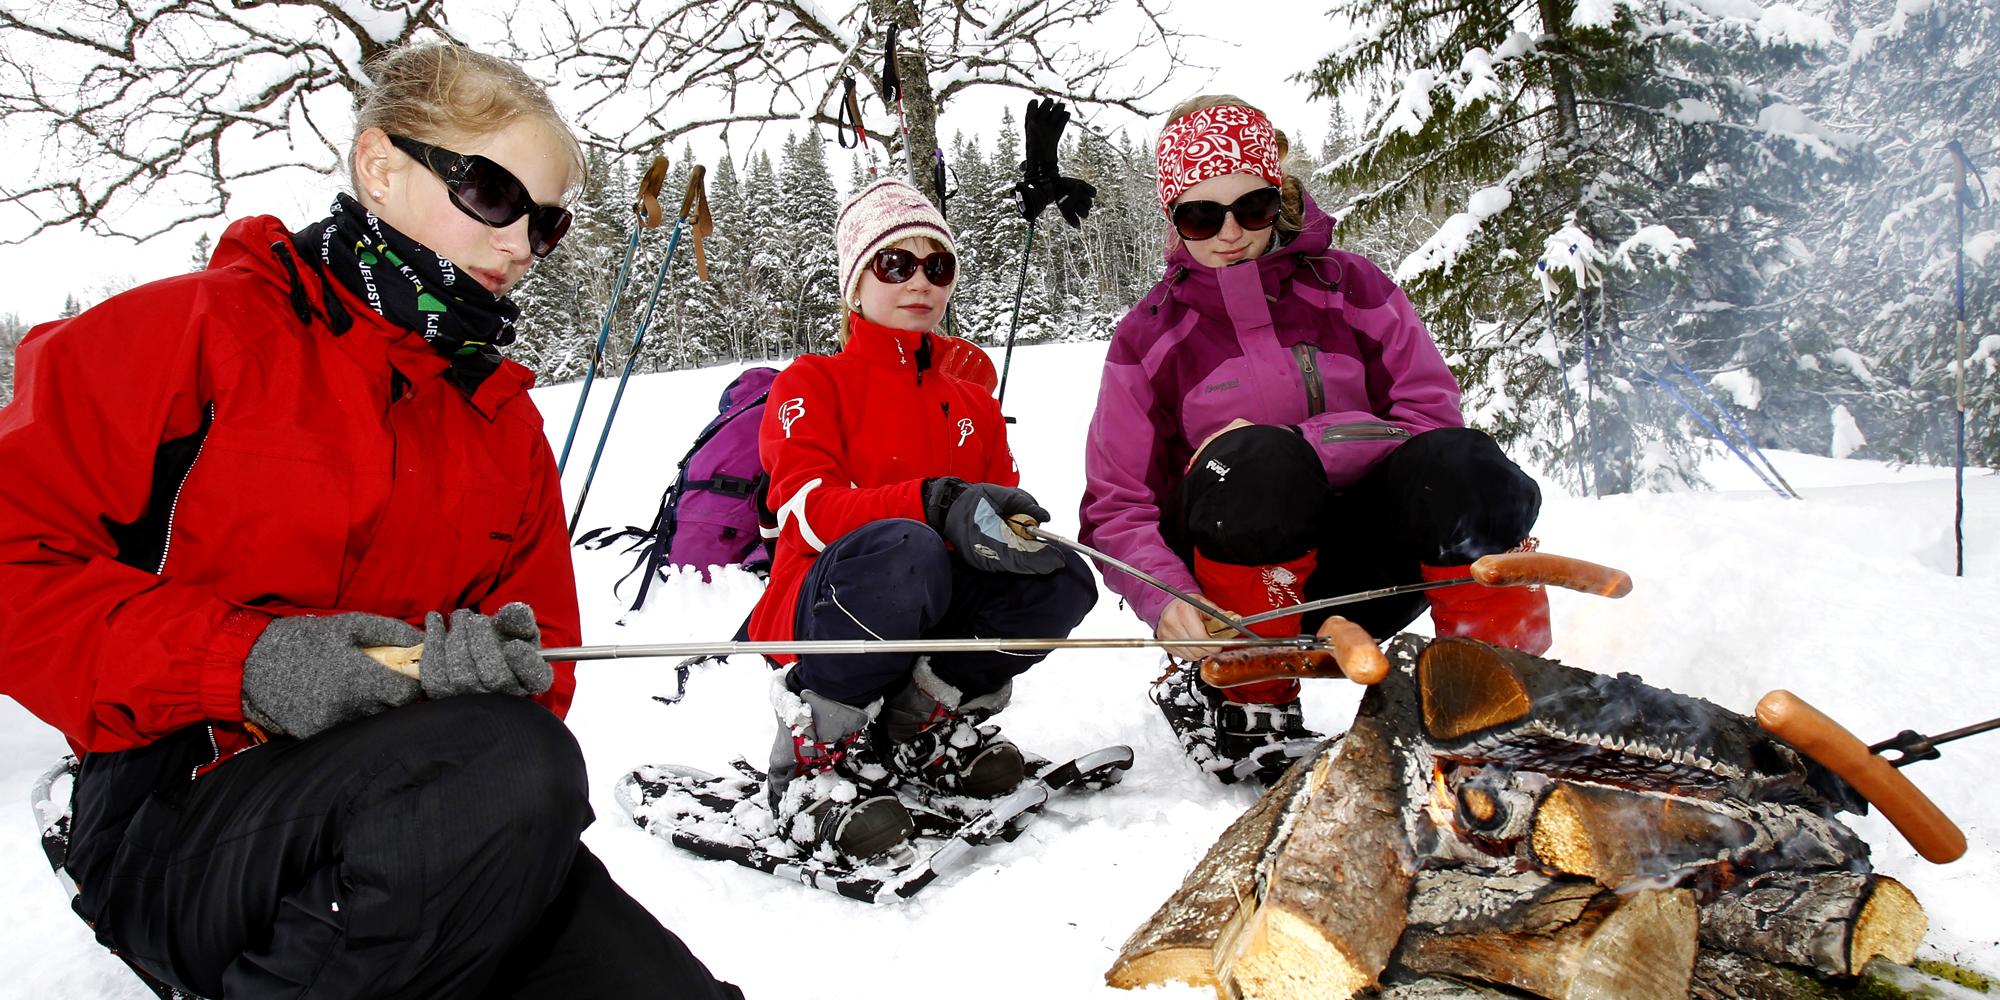 Mokk farm - snow shoeing. Copyright: Mokk gård